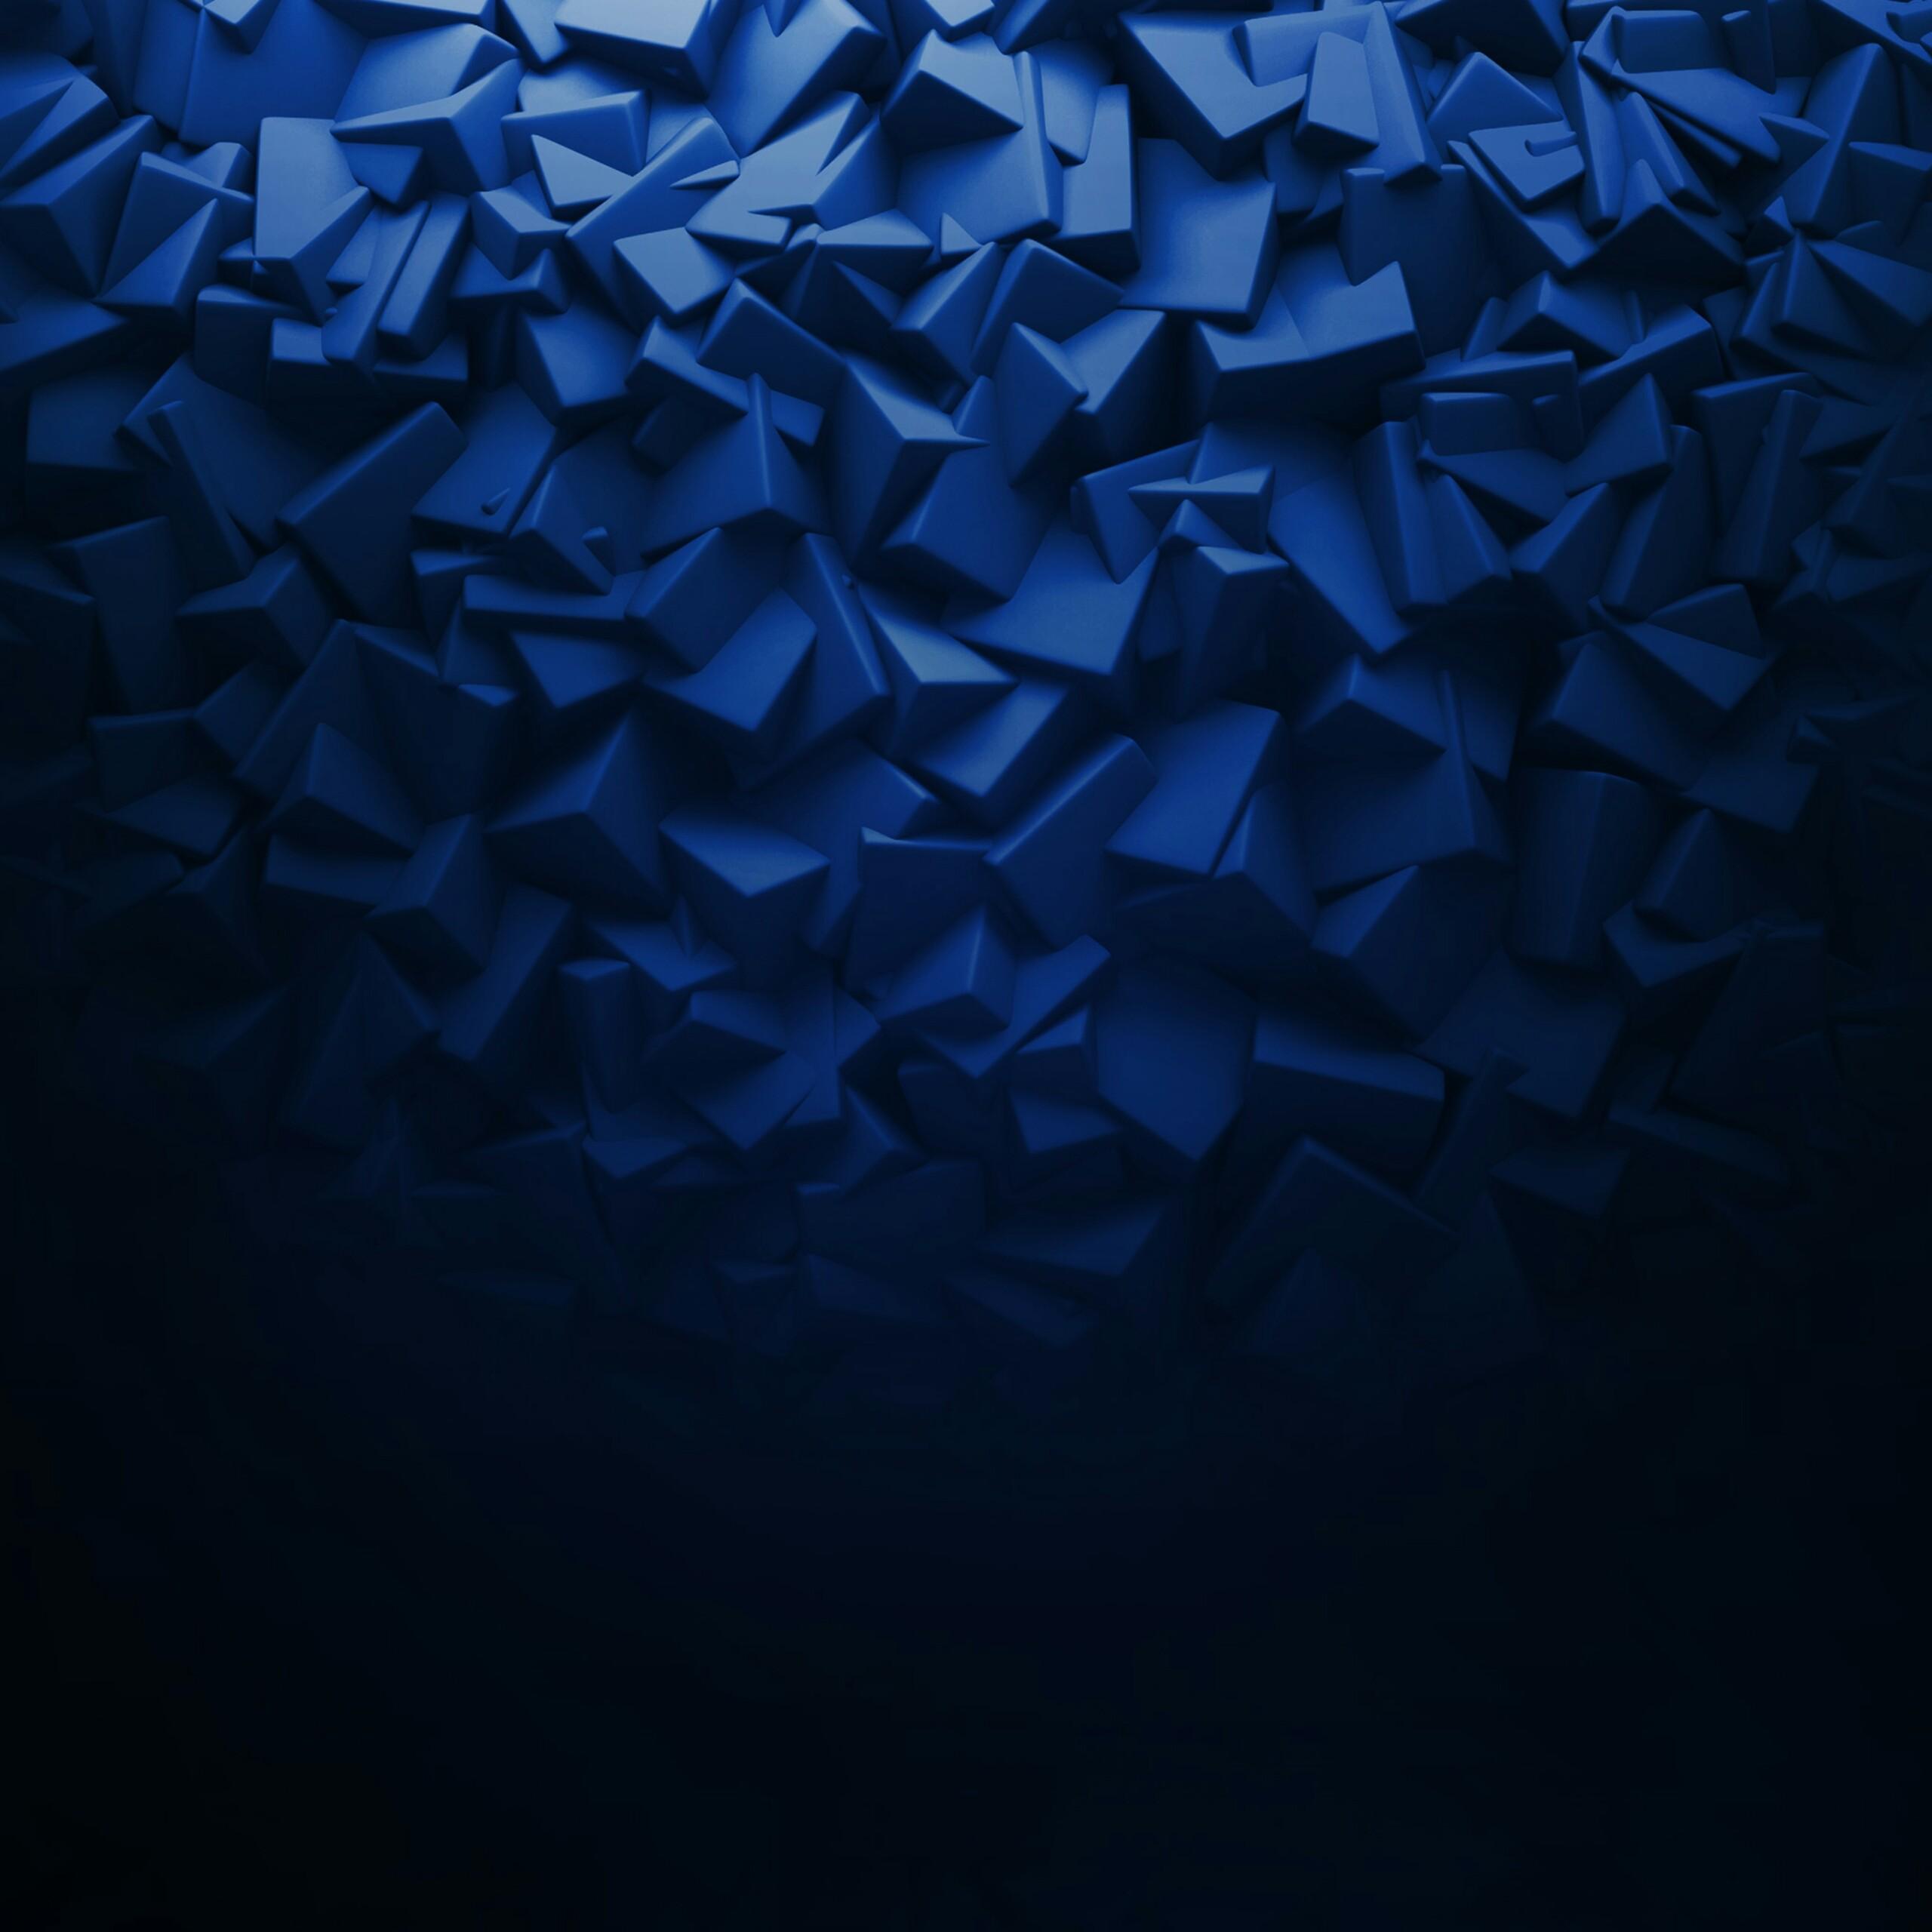 3D Blue Abstract Qhd Full HD Wallpaper